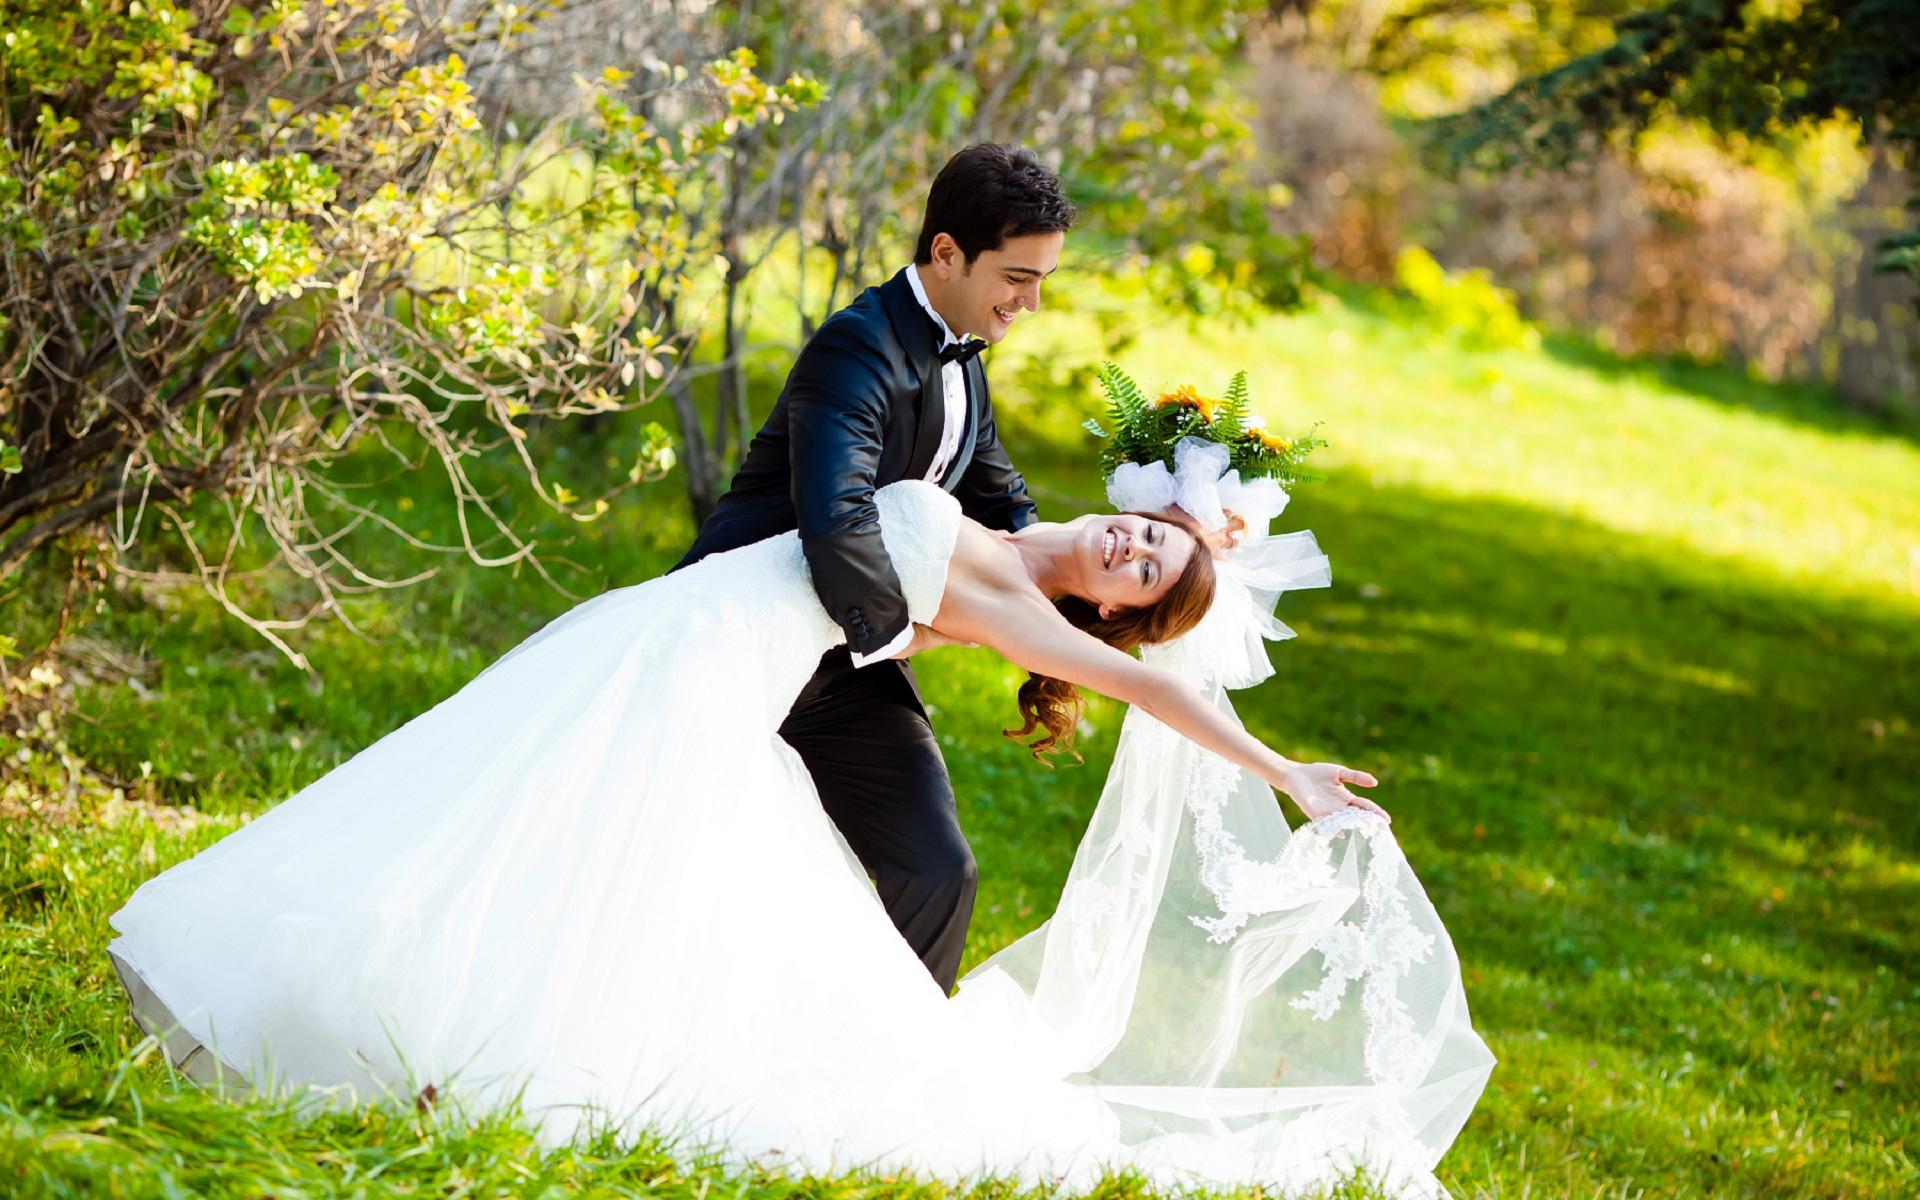 Wedding Couple Wallpapers Hd Inovasingold Com